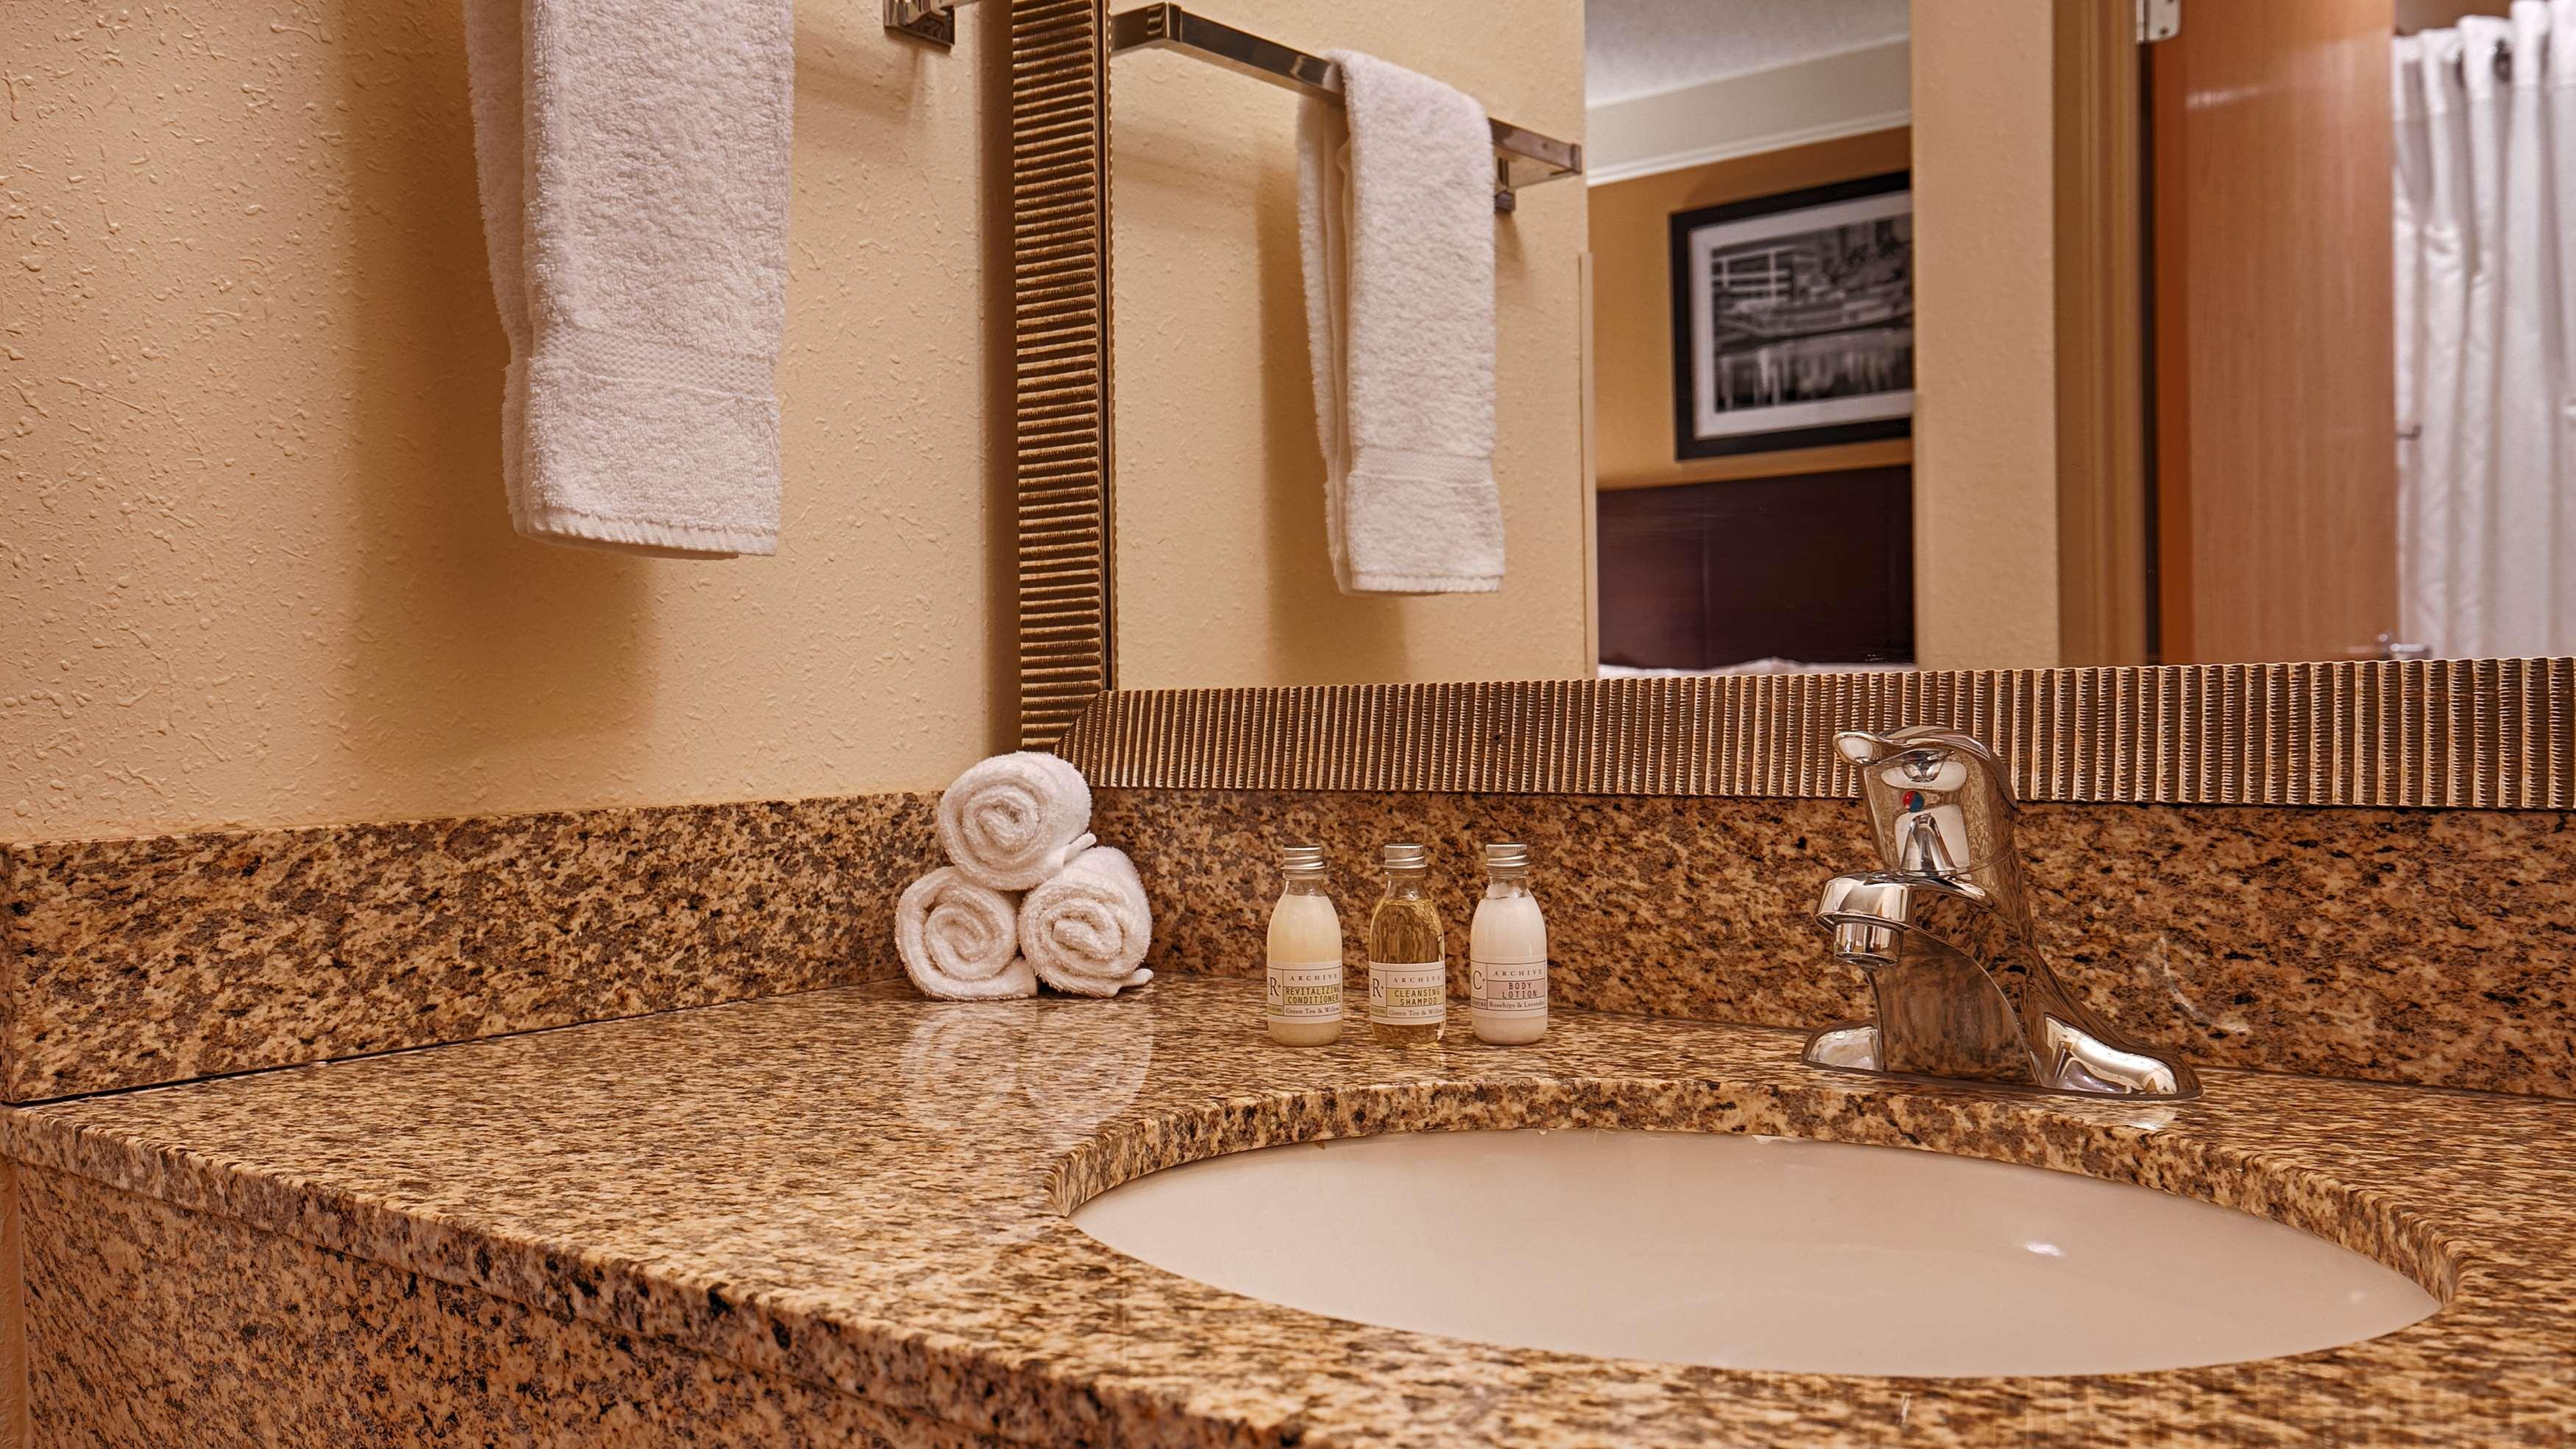 Best western plus peoria east peoria il business for Bathrooms plus peoria il